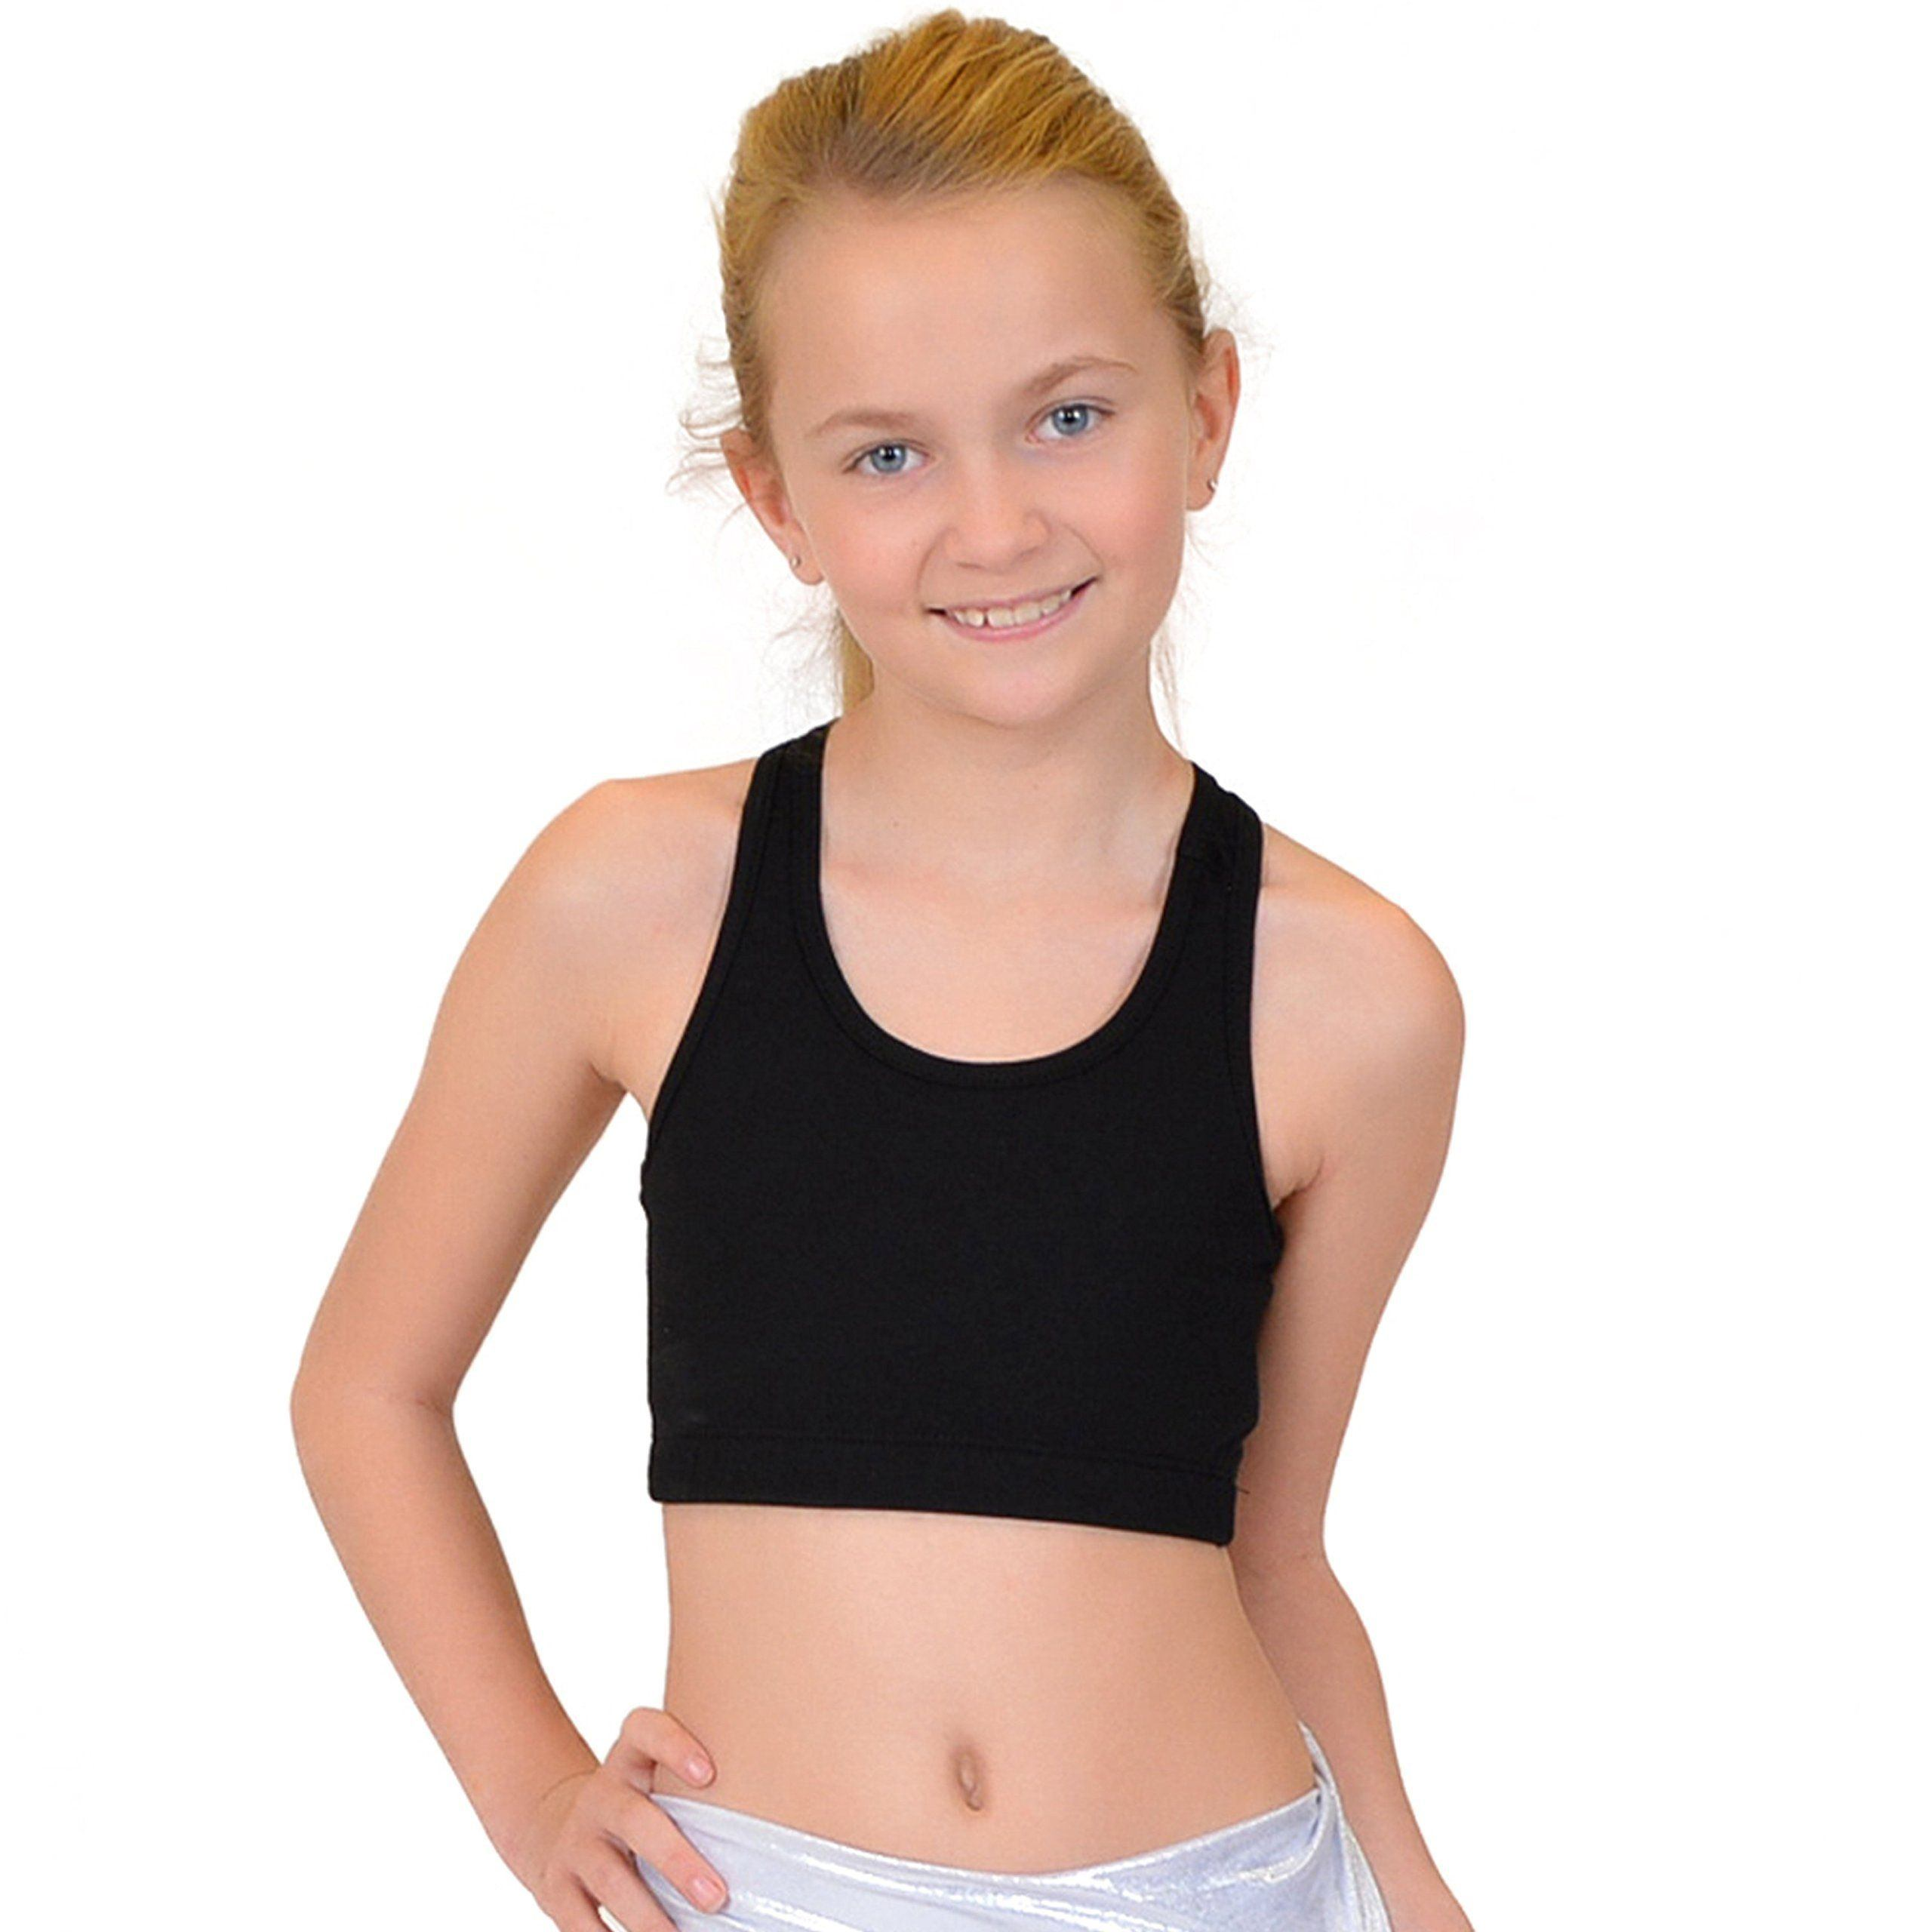 Alias reccomend Training bra nip slip